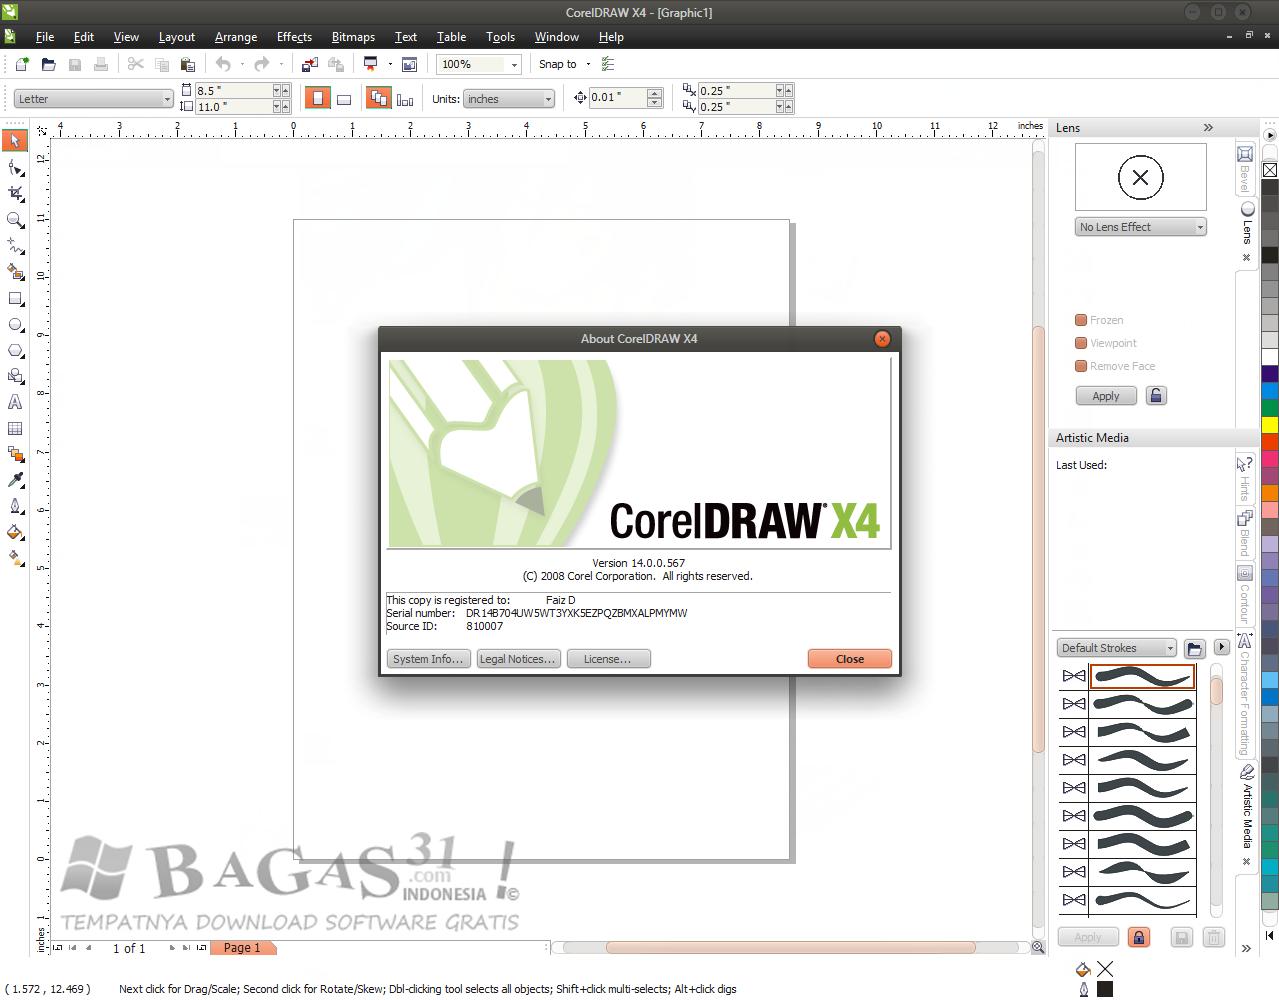 Coreldraw version 12 - Cara Aktivasi Coreldraw X4